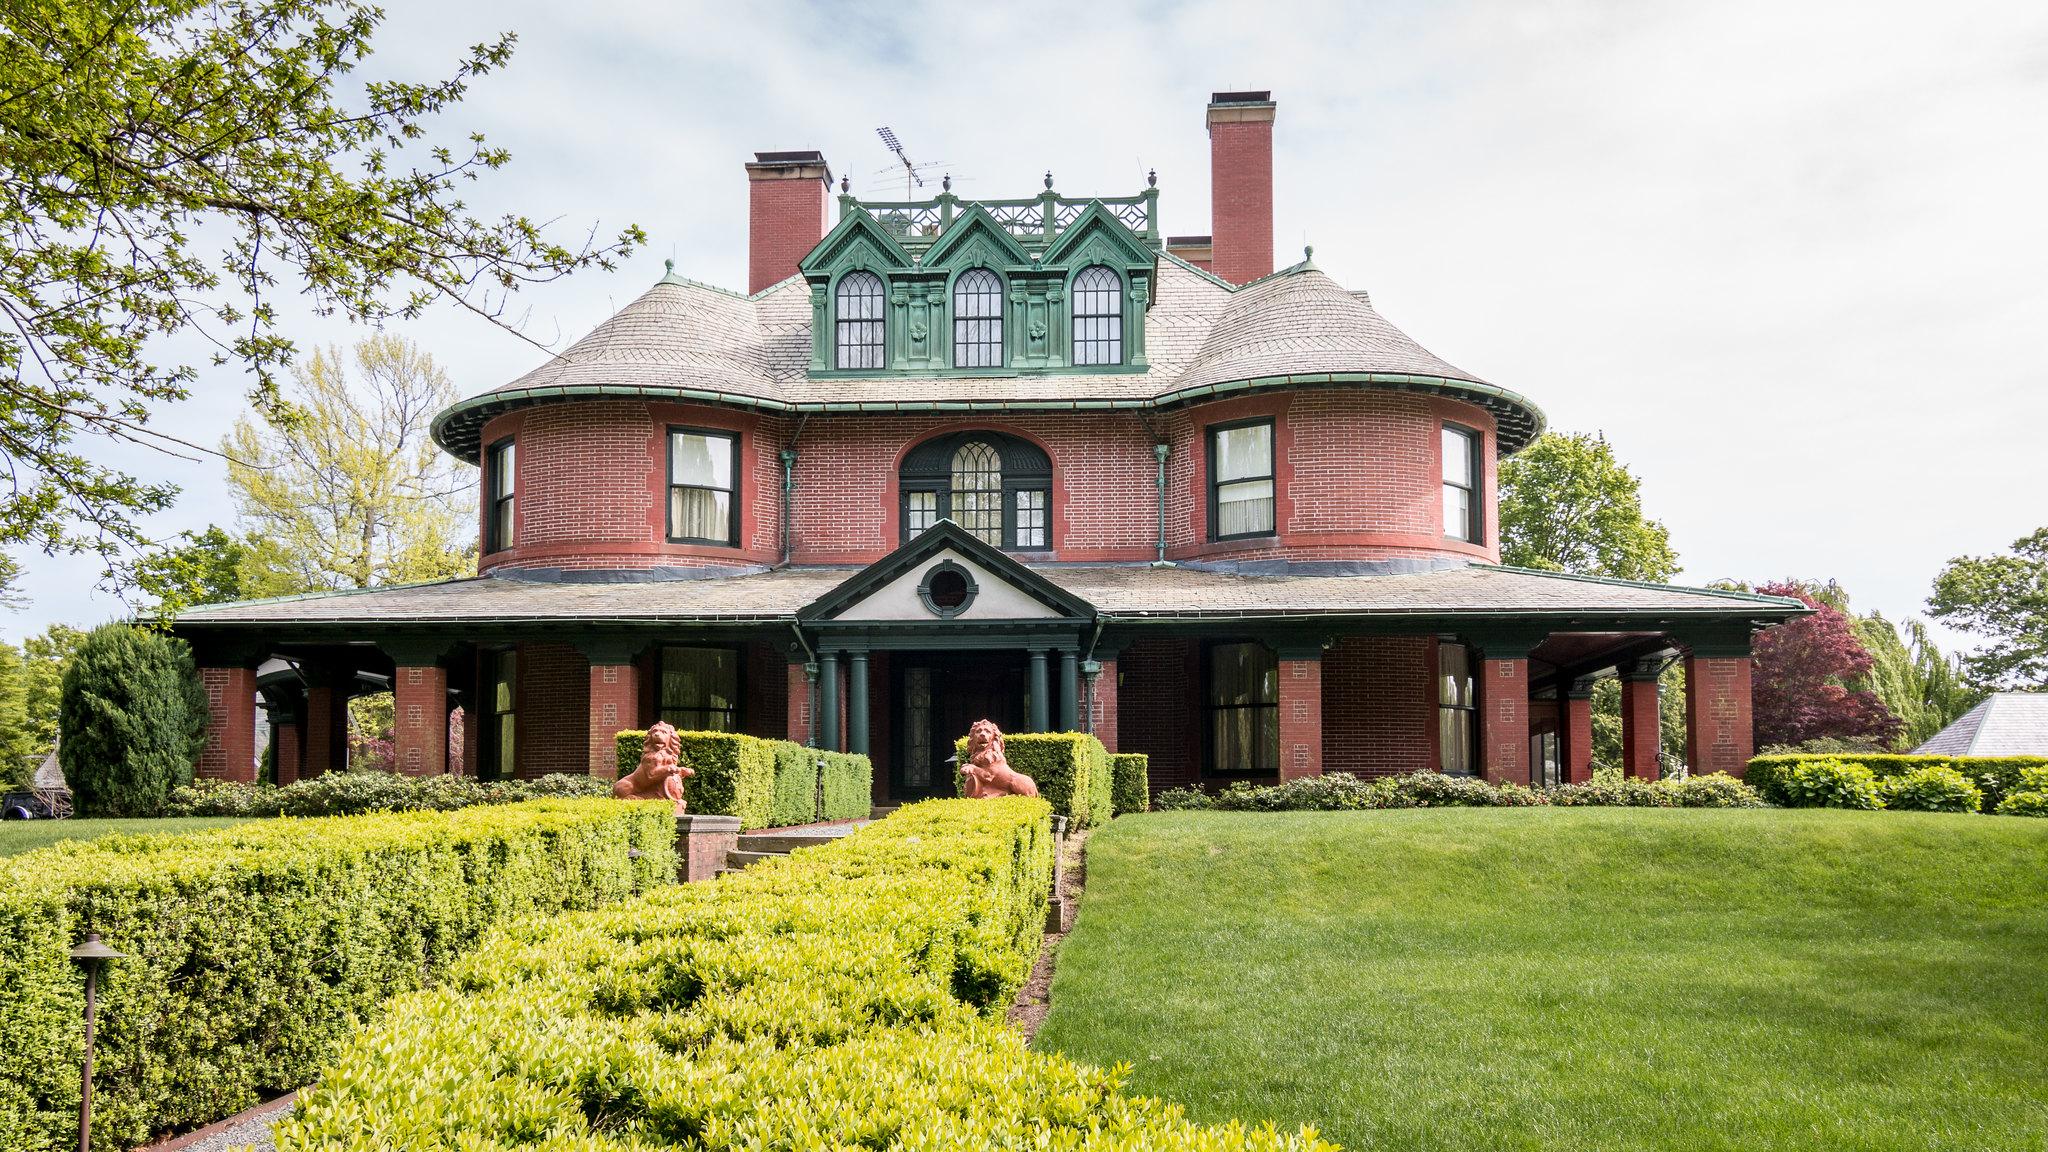 Newport - Massachusetts - [USA]